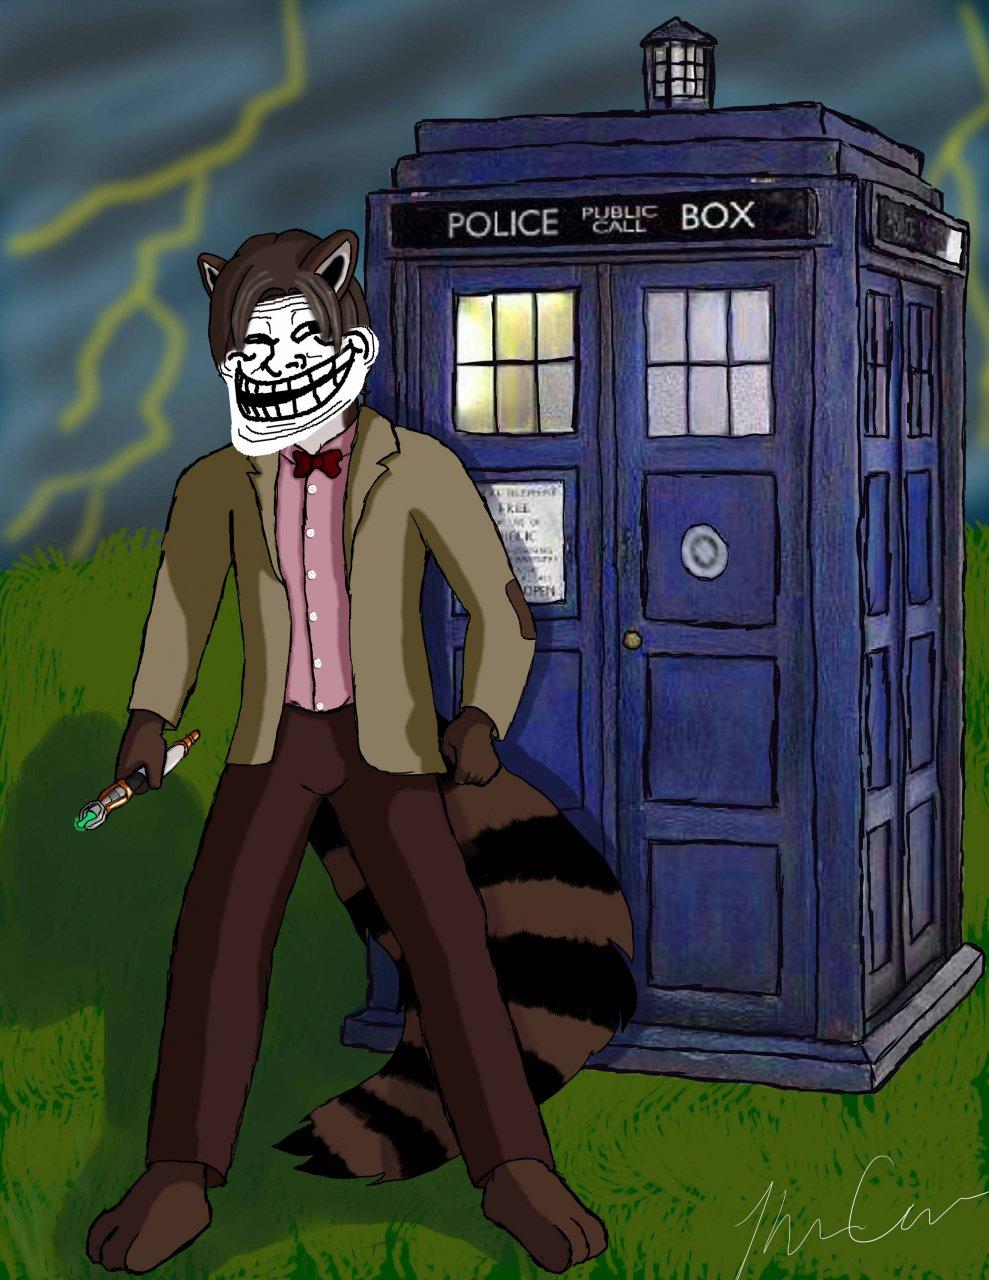 Most recent image: Basically...RUN! (troll)